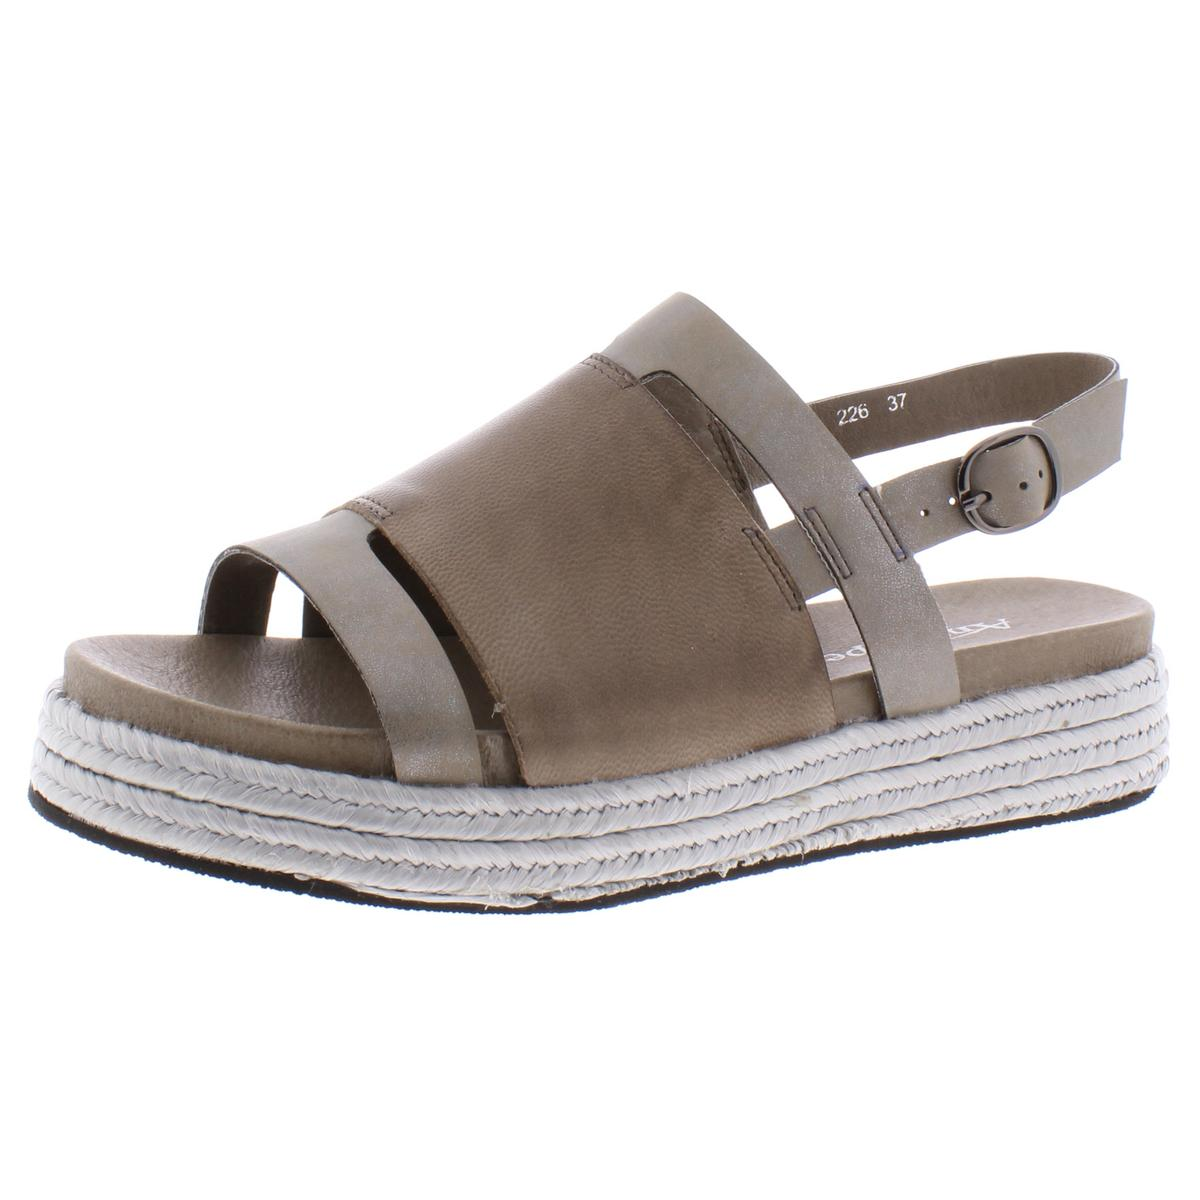 Antelope Womens Leather Slingback Wedge Flatform Sandals Platforms BHFO  1551 | eBay